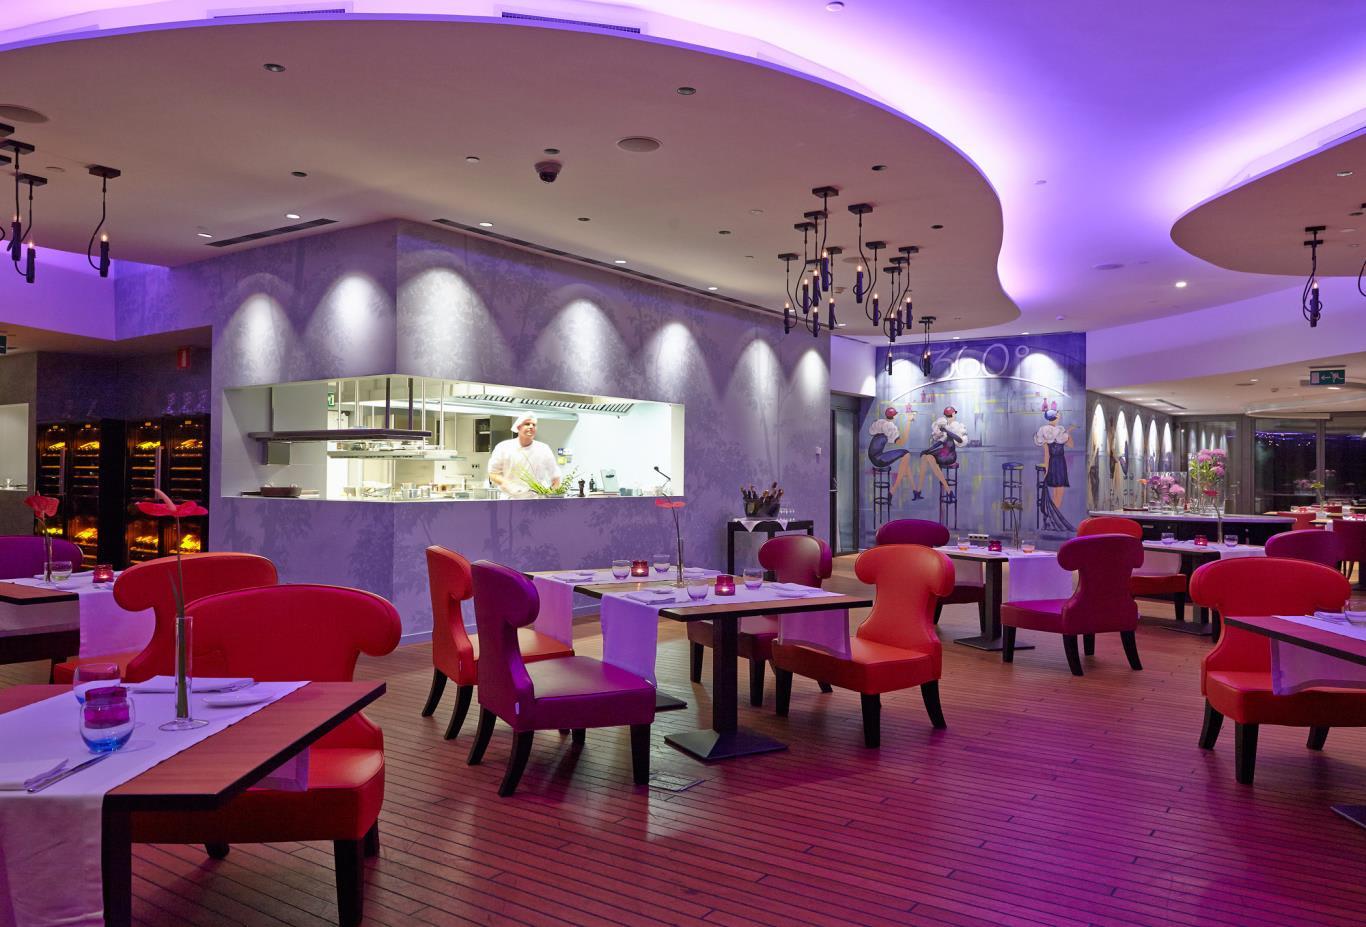 Atelier Lounge & Cocktails